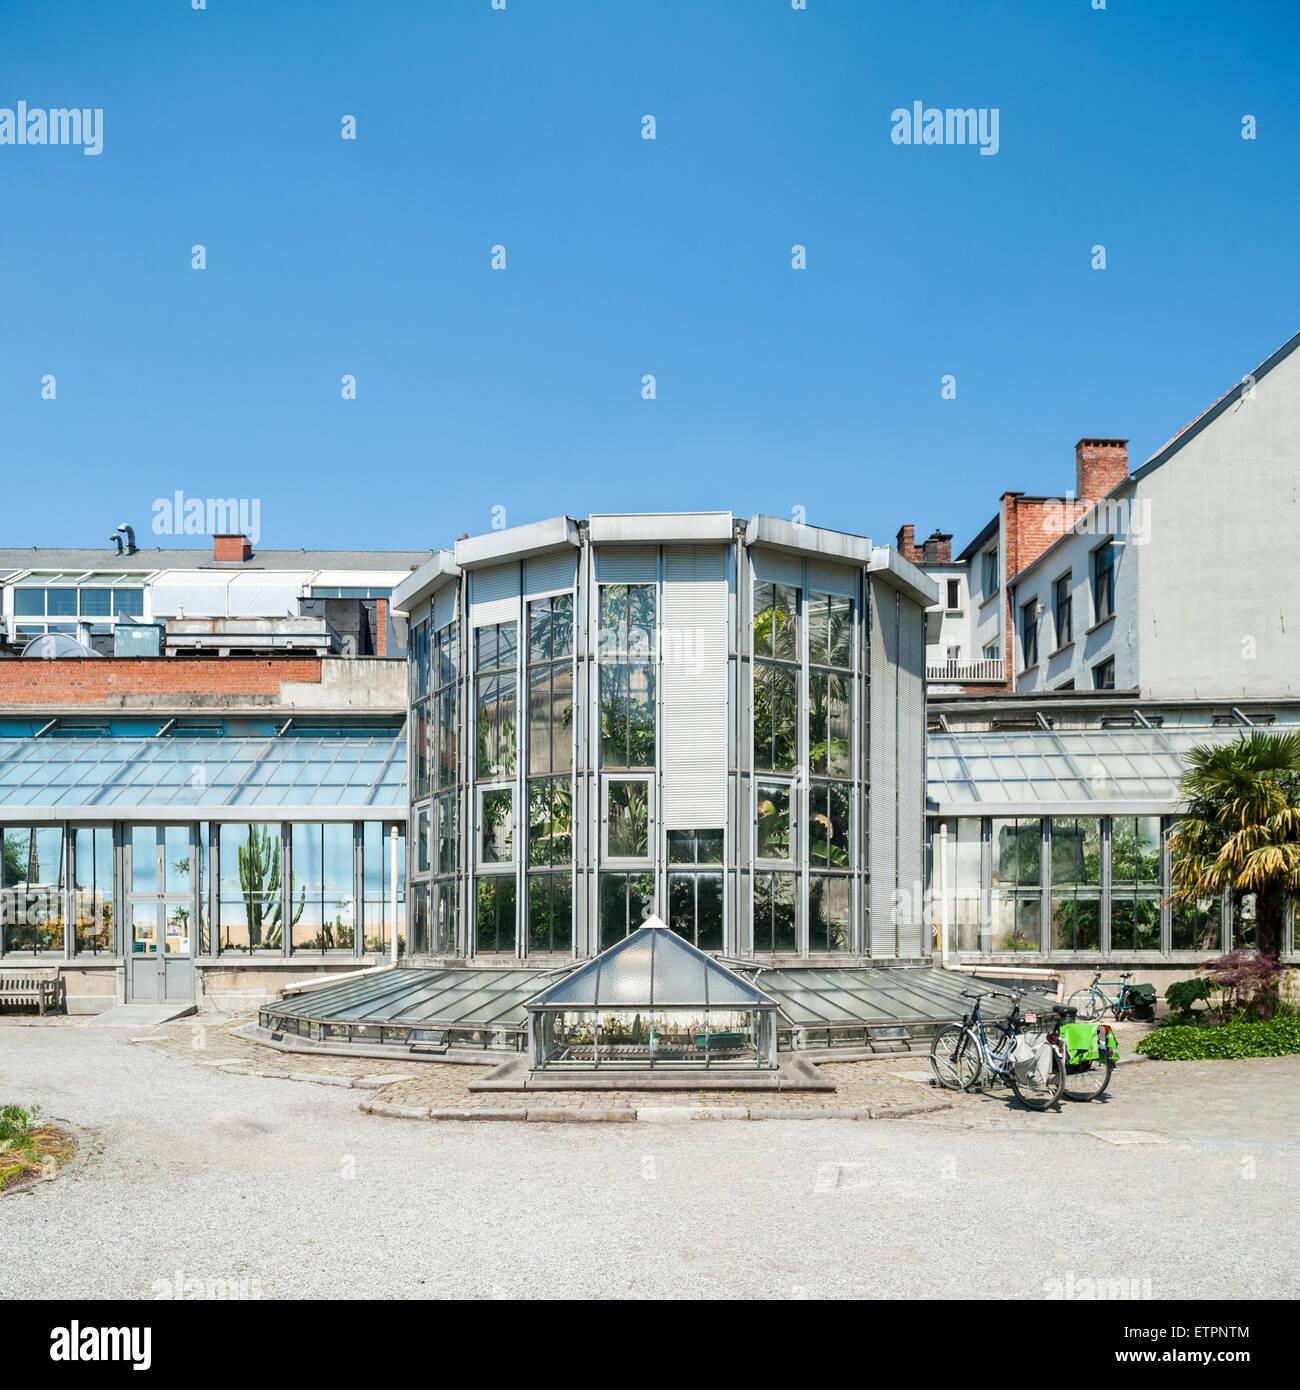 Belgium, Antwerp, greenery in the botanical garden - Stock Image